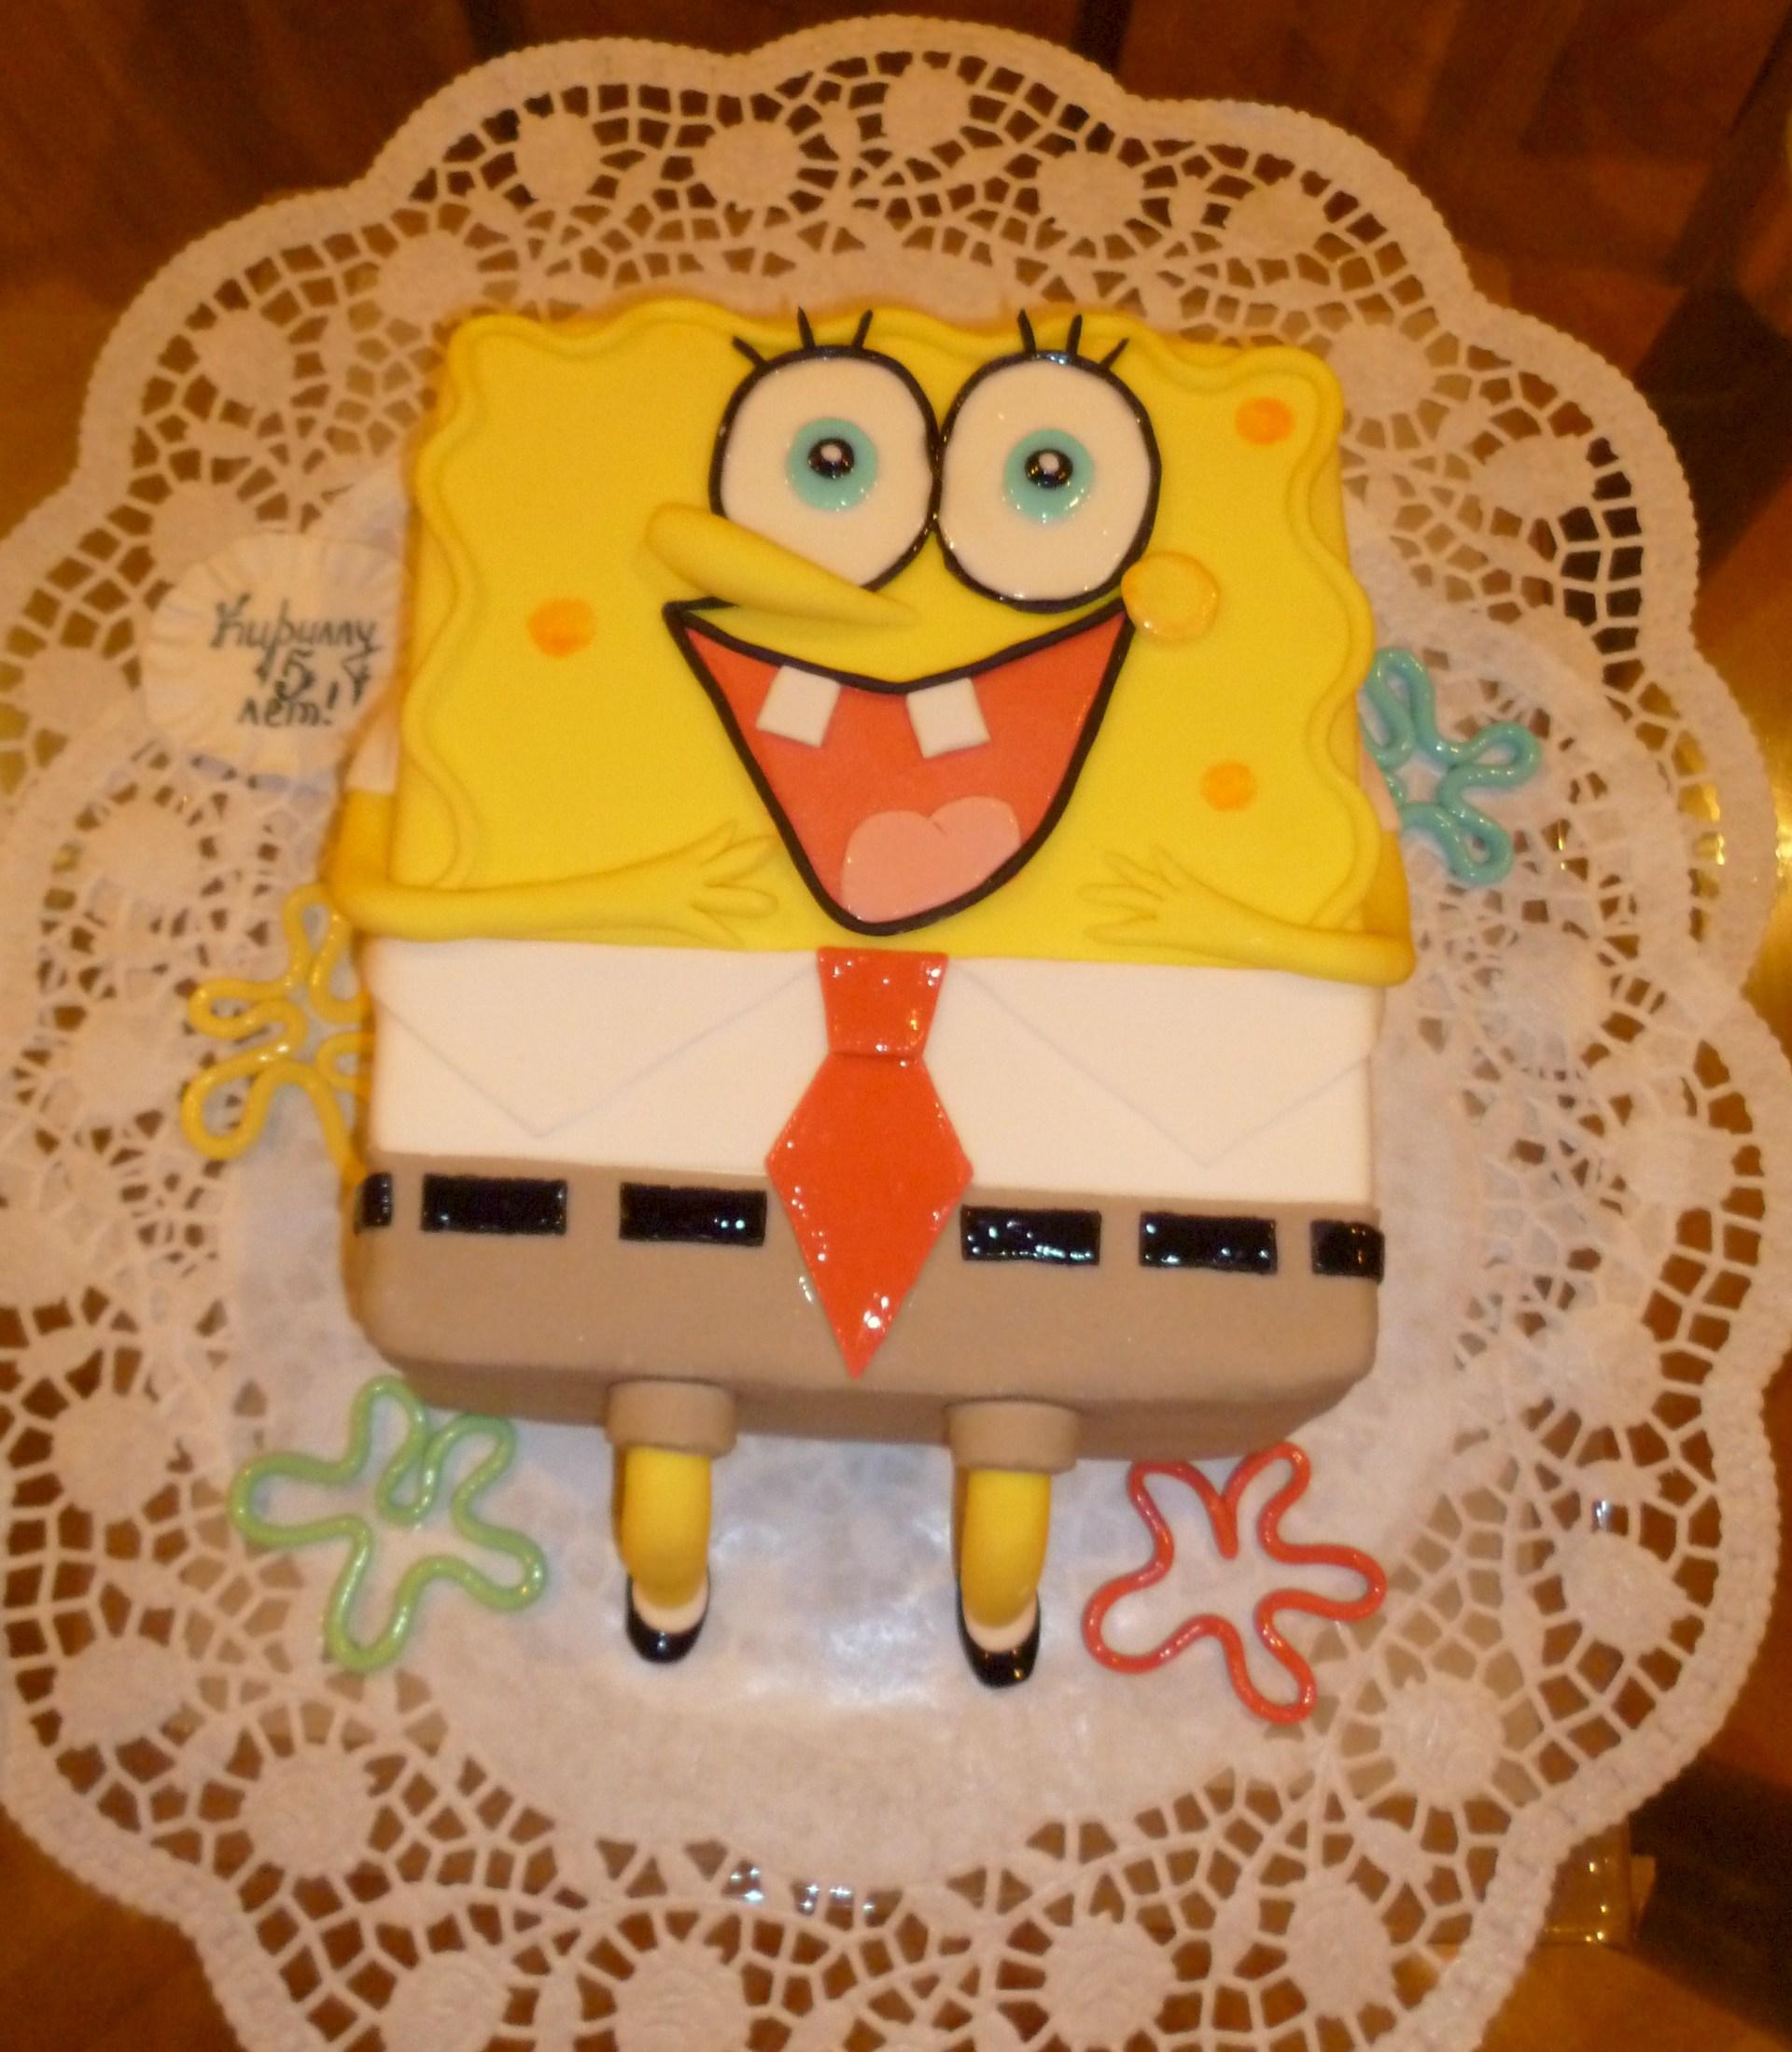 Ютуб мастер класс торт кутузов идеи #4